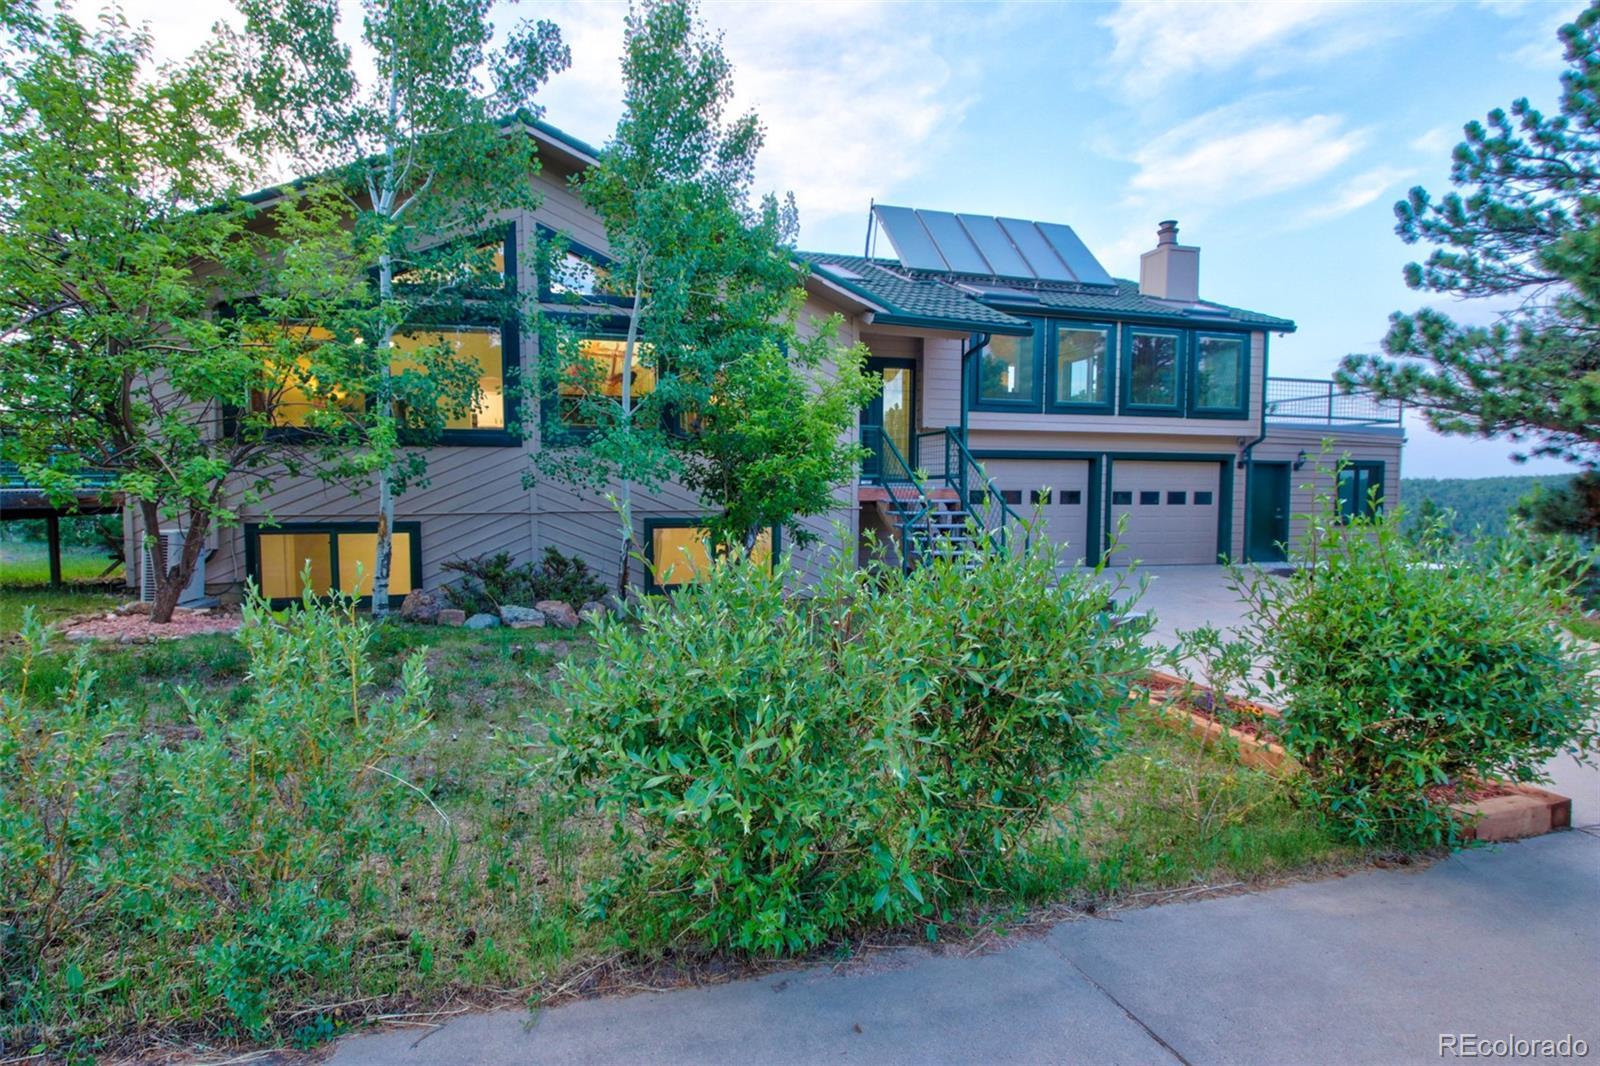 MLS# 1691148 - 1 - 384 Deer Trail Road, Boulder, CO 80302